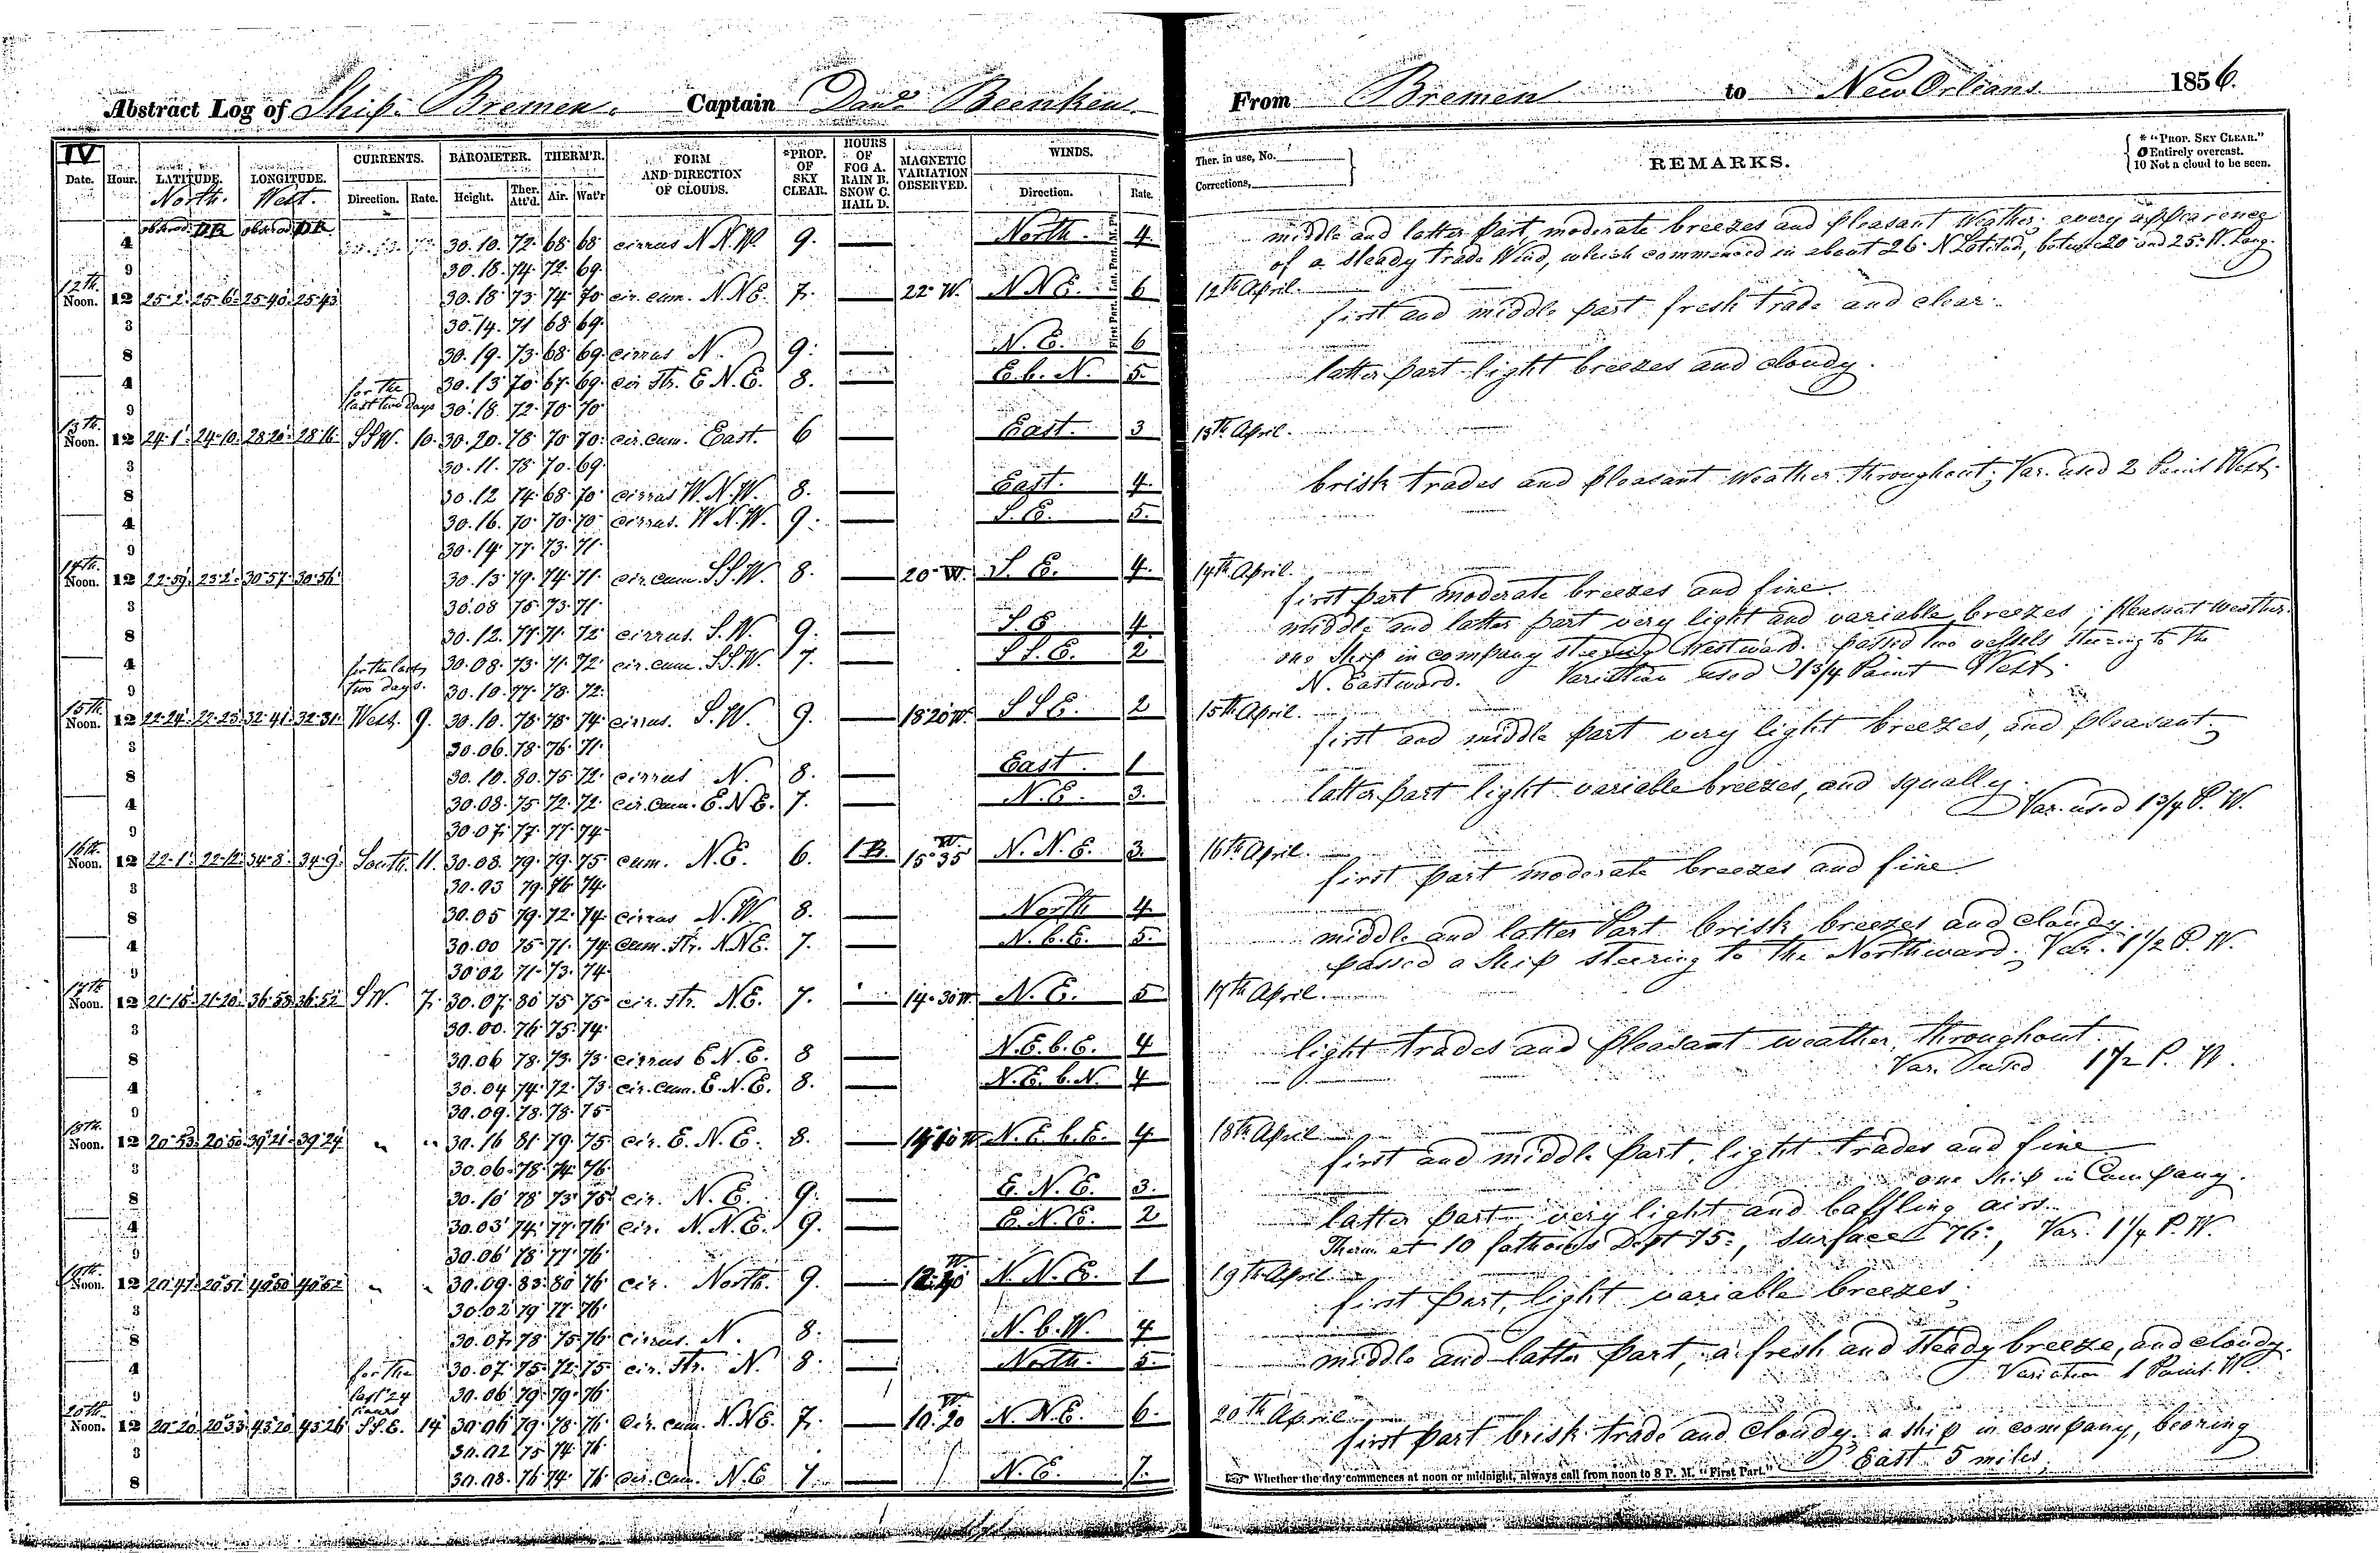 Photo of the Bremen's April 1856 ship log